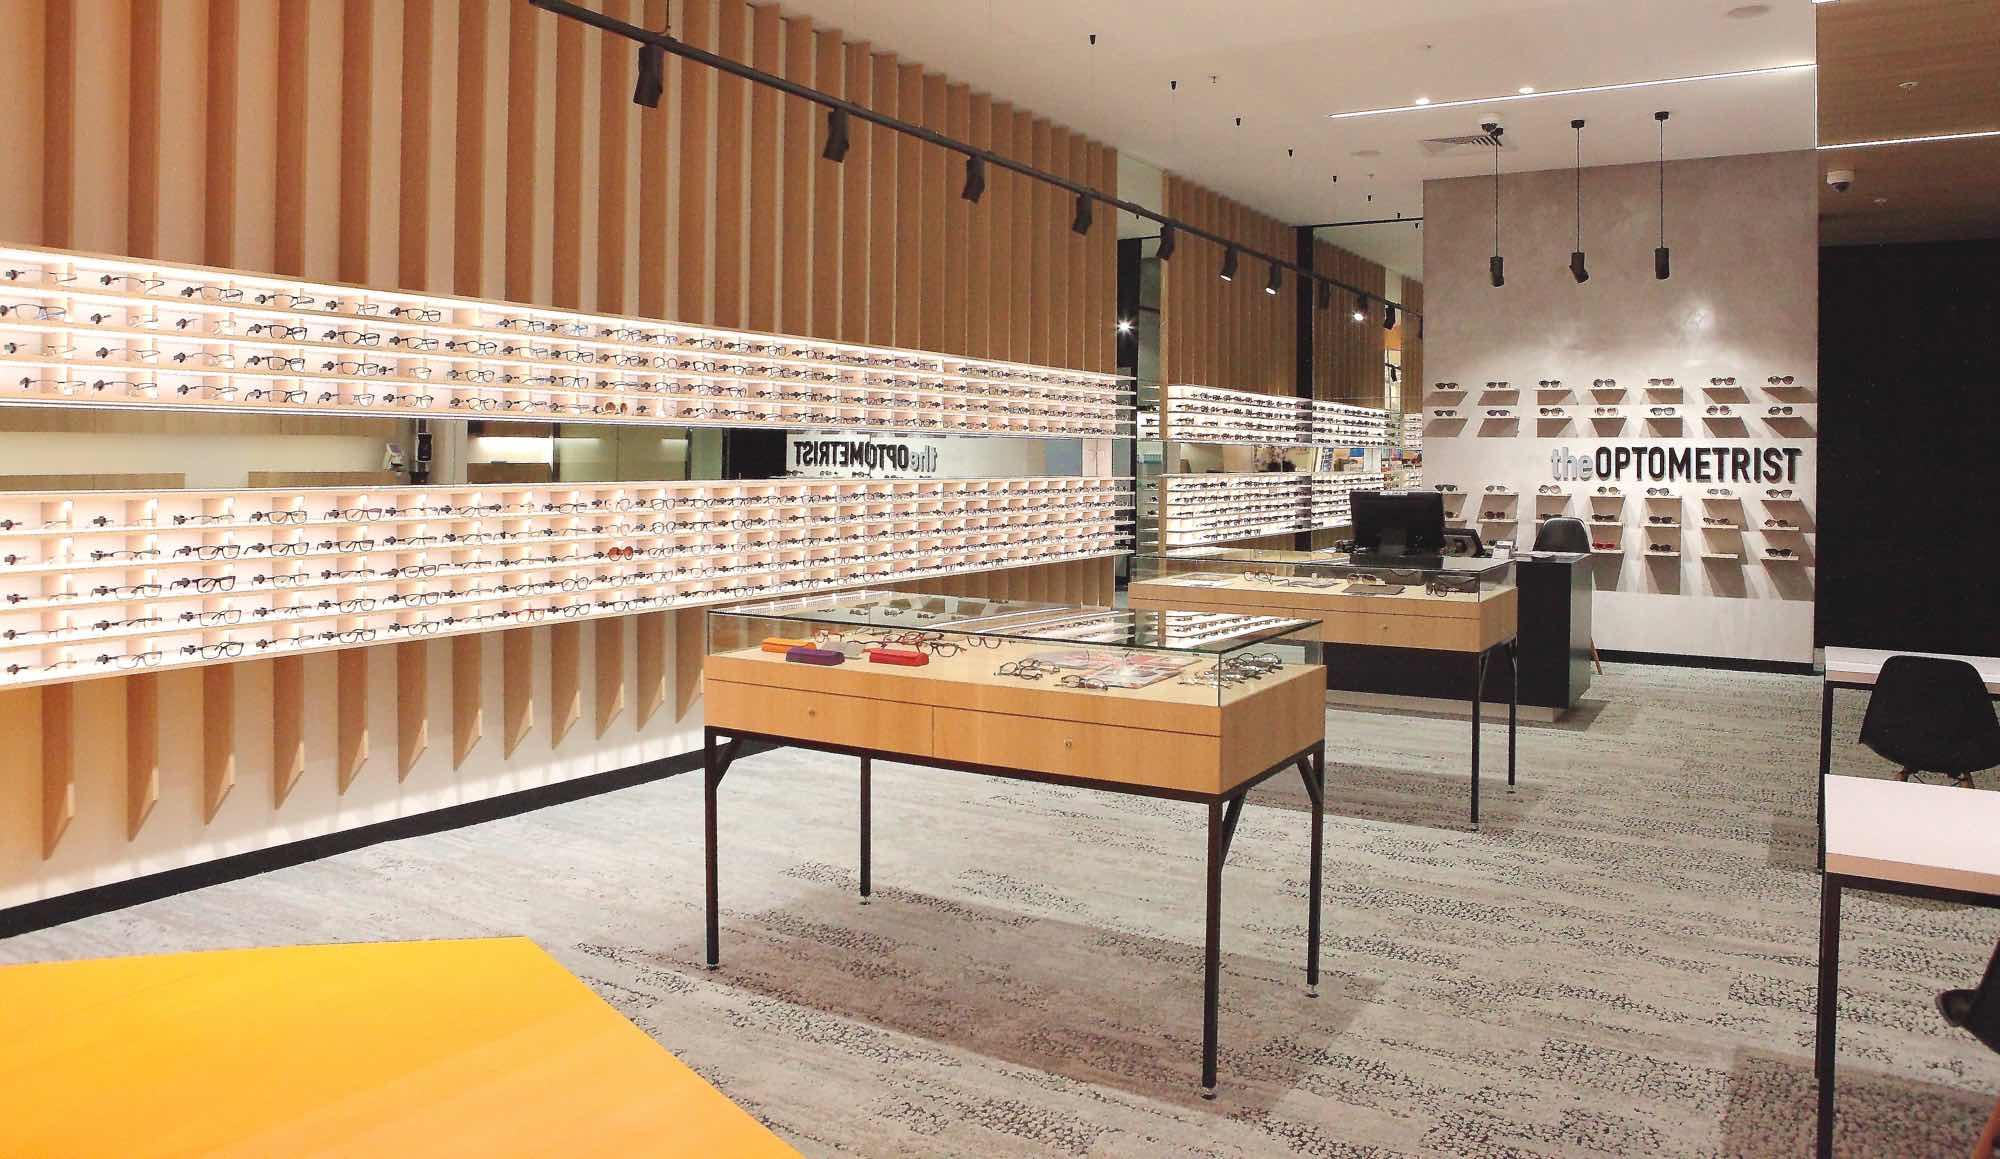 The Optometrist Interior Store Image